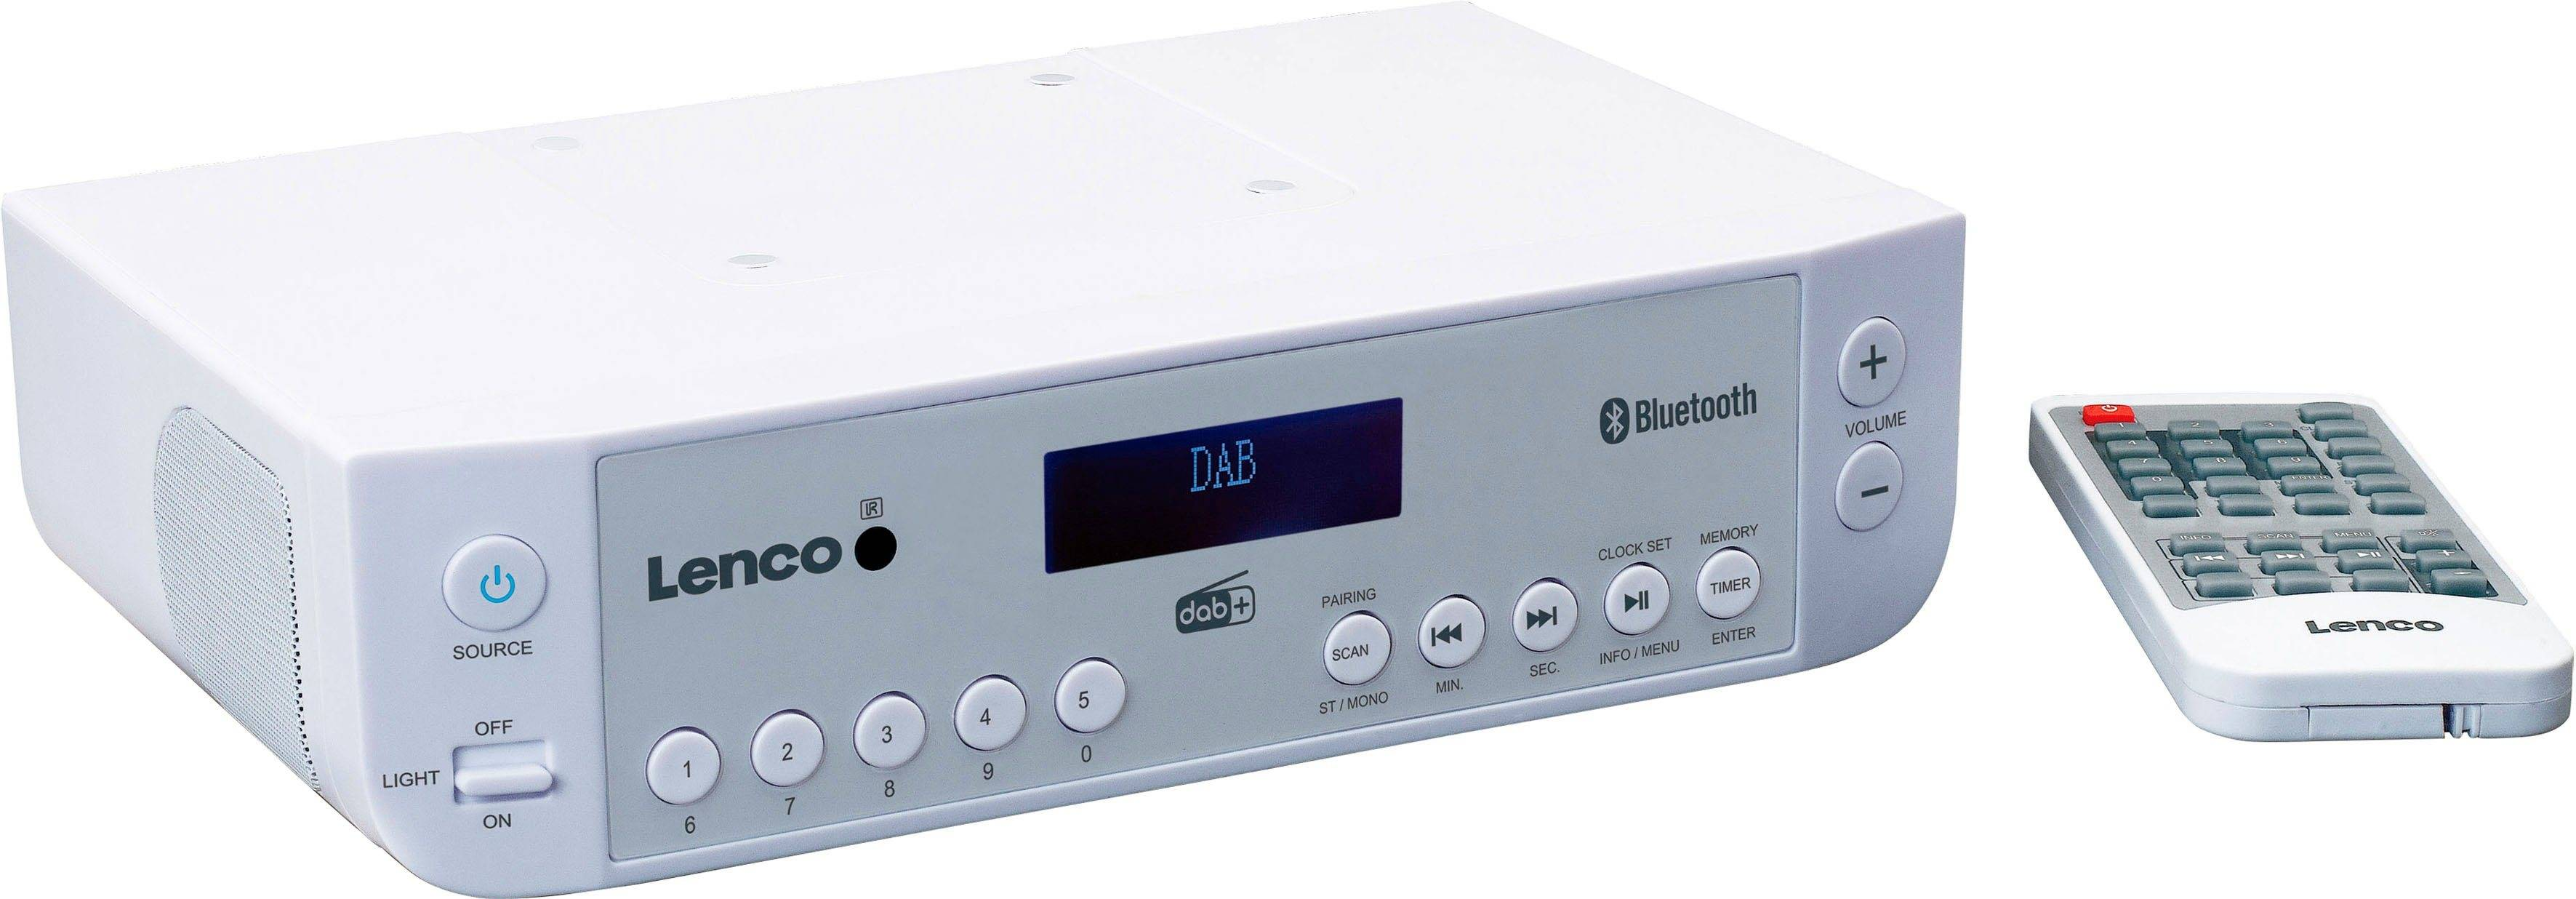 Lenco »KCR-200« Küchen-Radio (Digitalradio (DAB), FM-Tuner mit RDS)